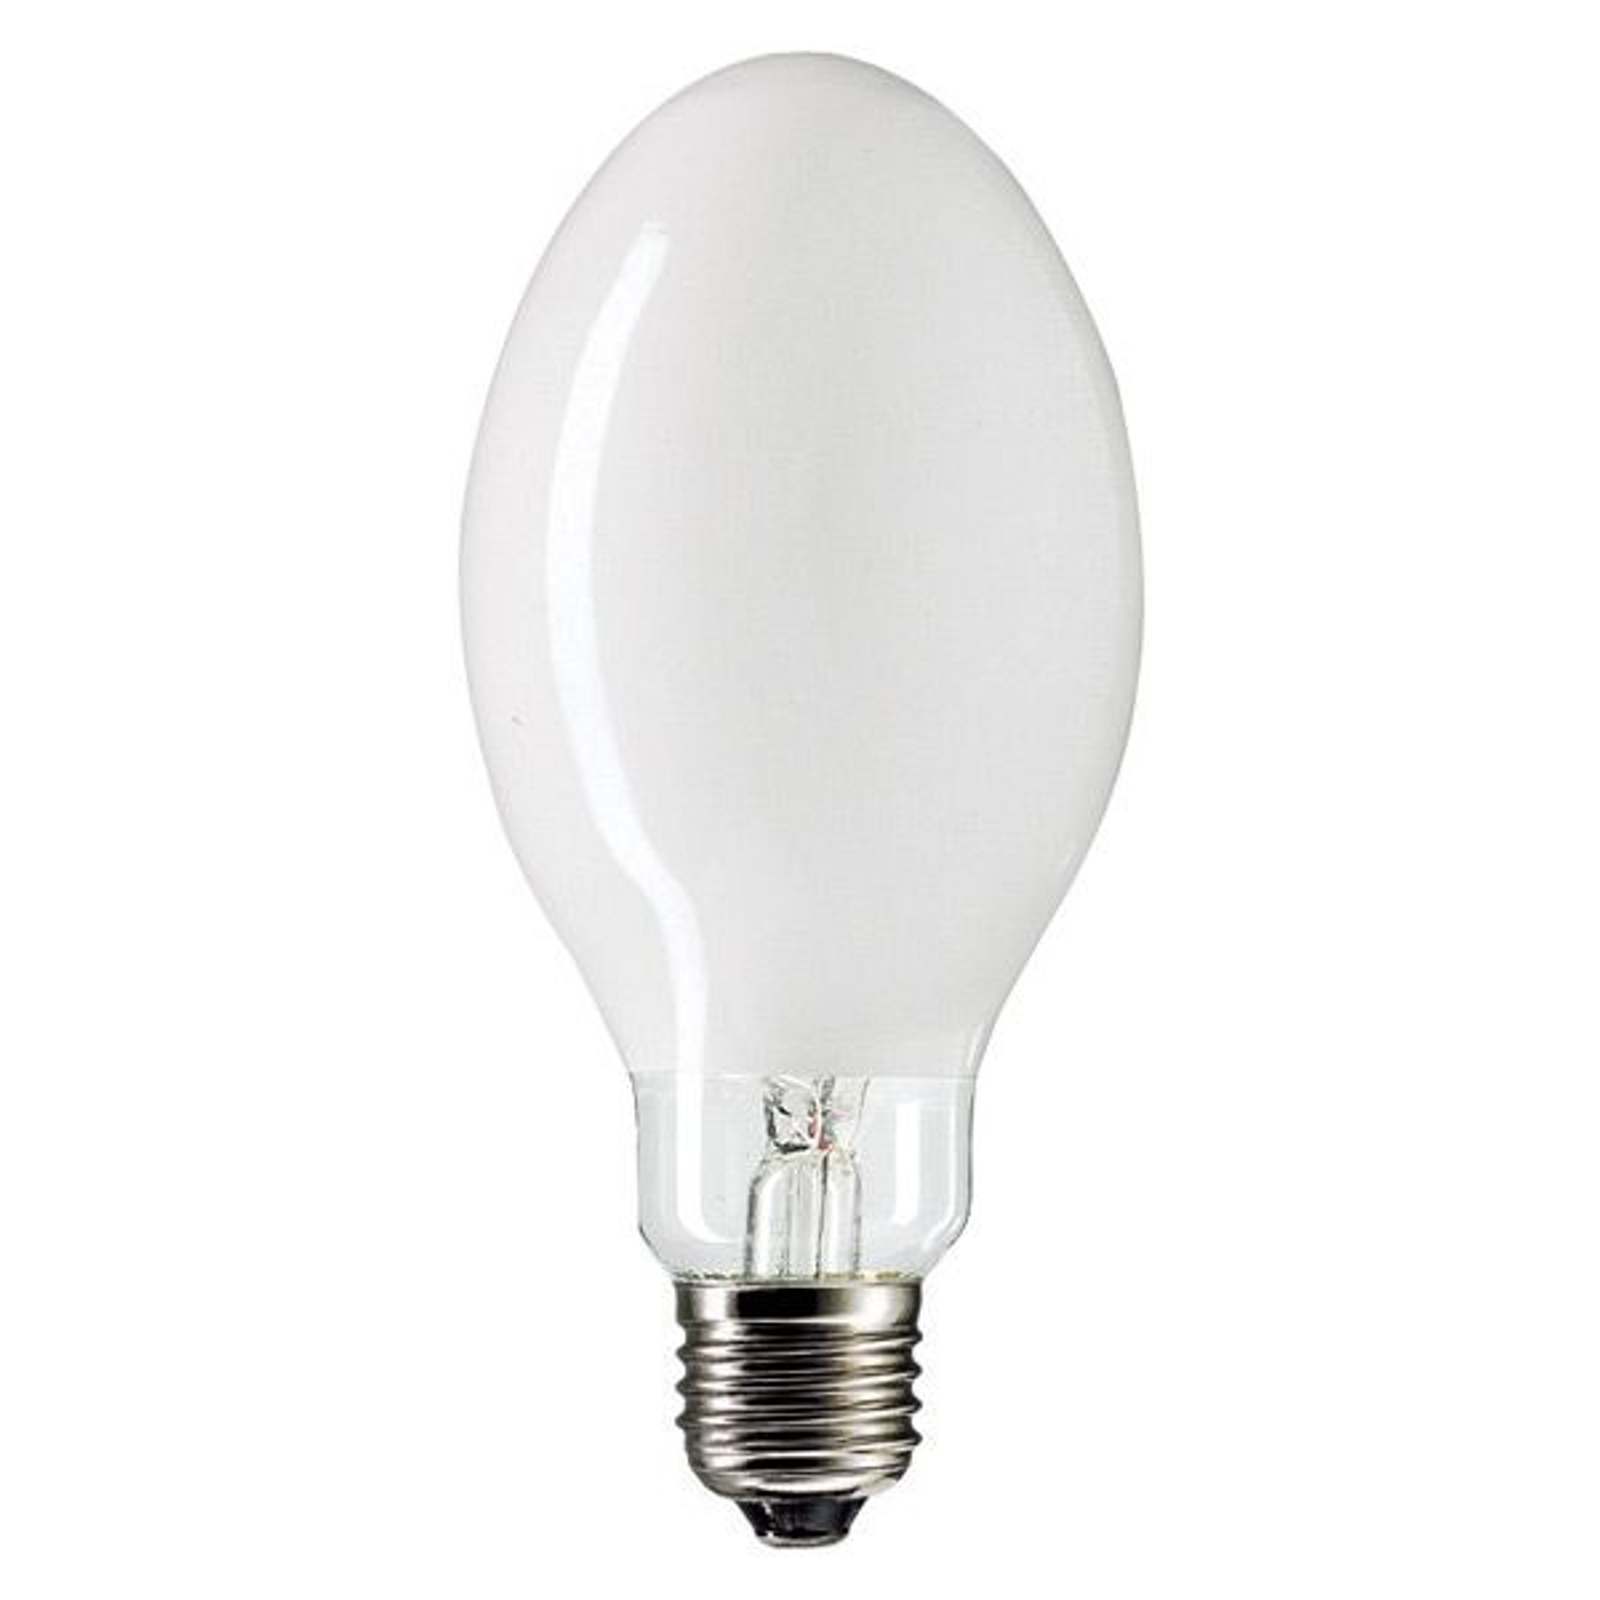 E40 100W 828 halogenová žárovka Master CDO-ET